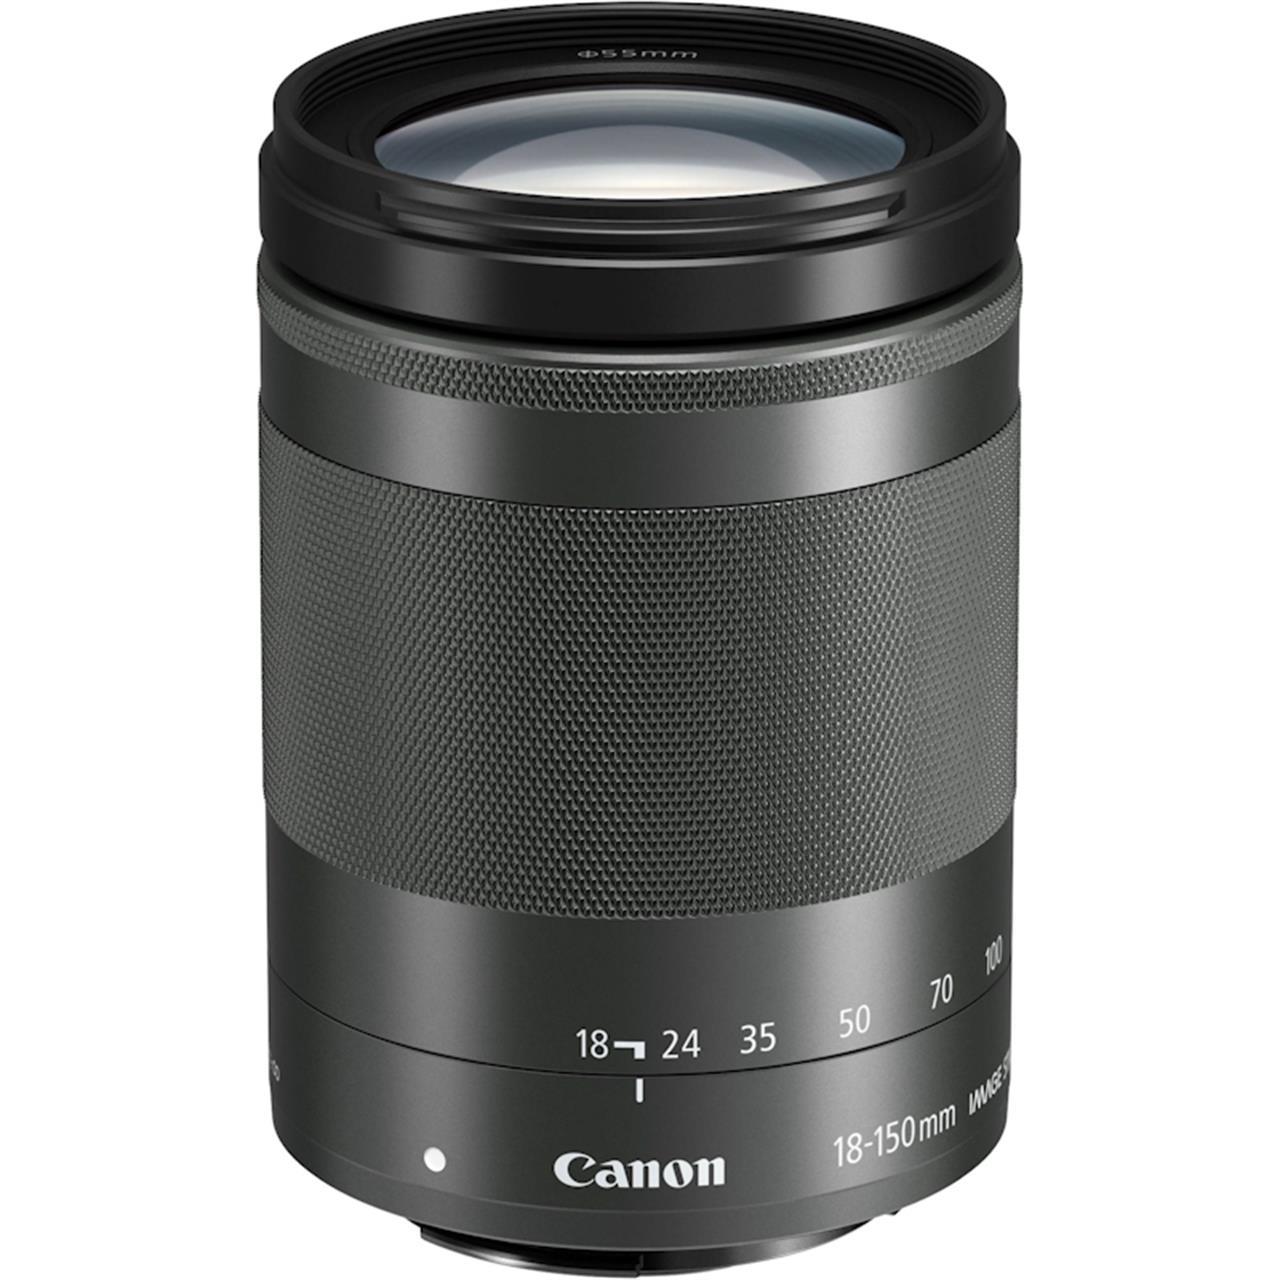 4549292063455__canon_ef-m_18-150mm_is_stm_hofma.jpg